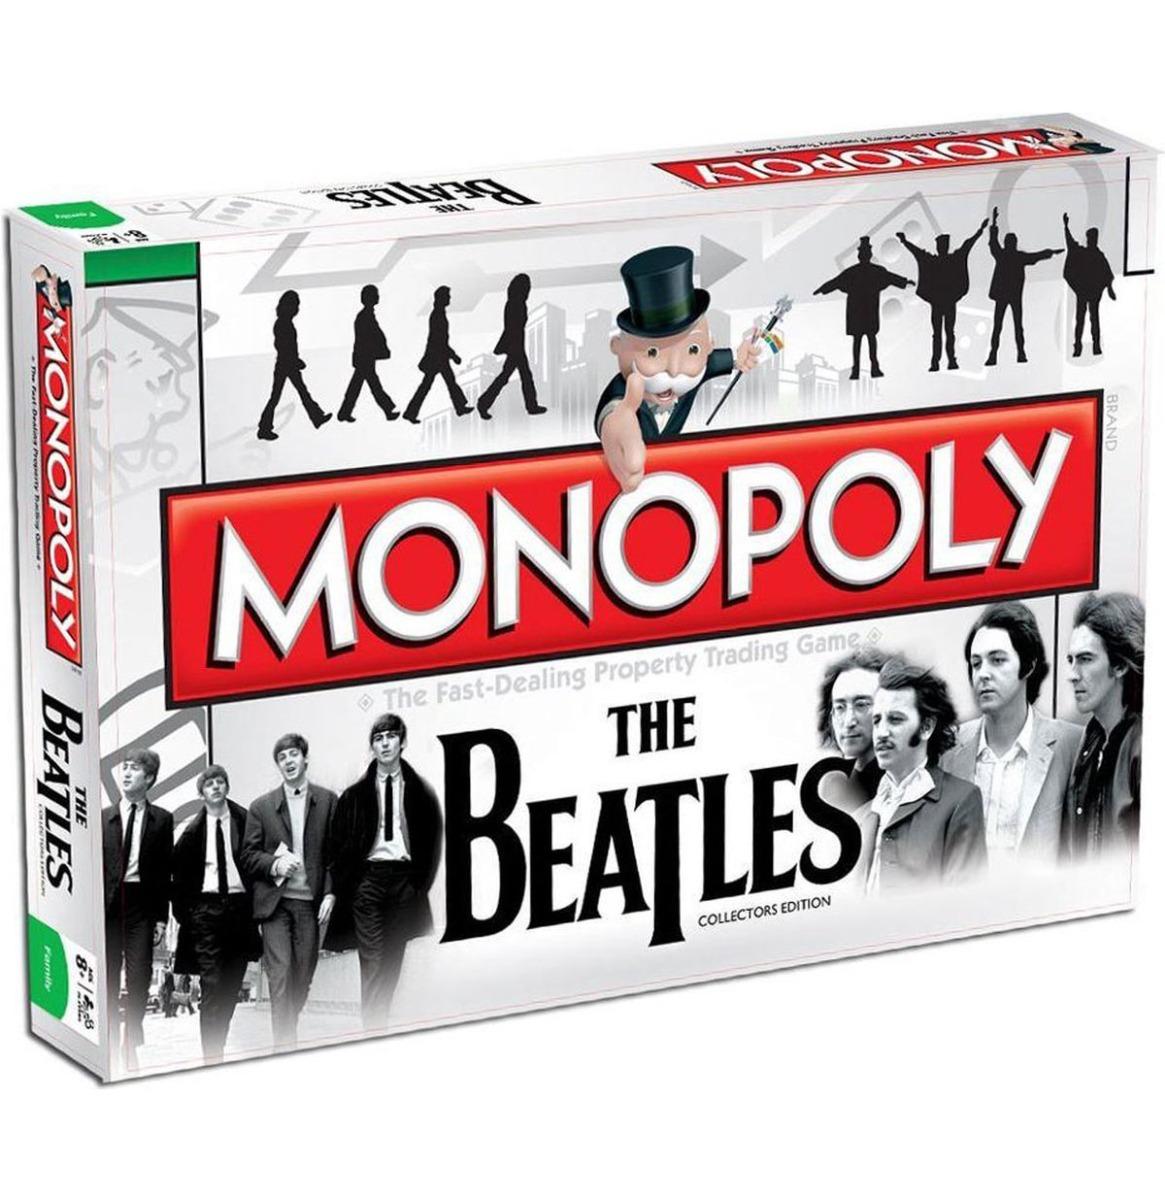 The Beatles Monopoly